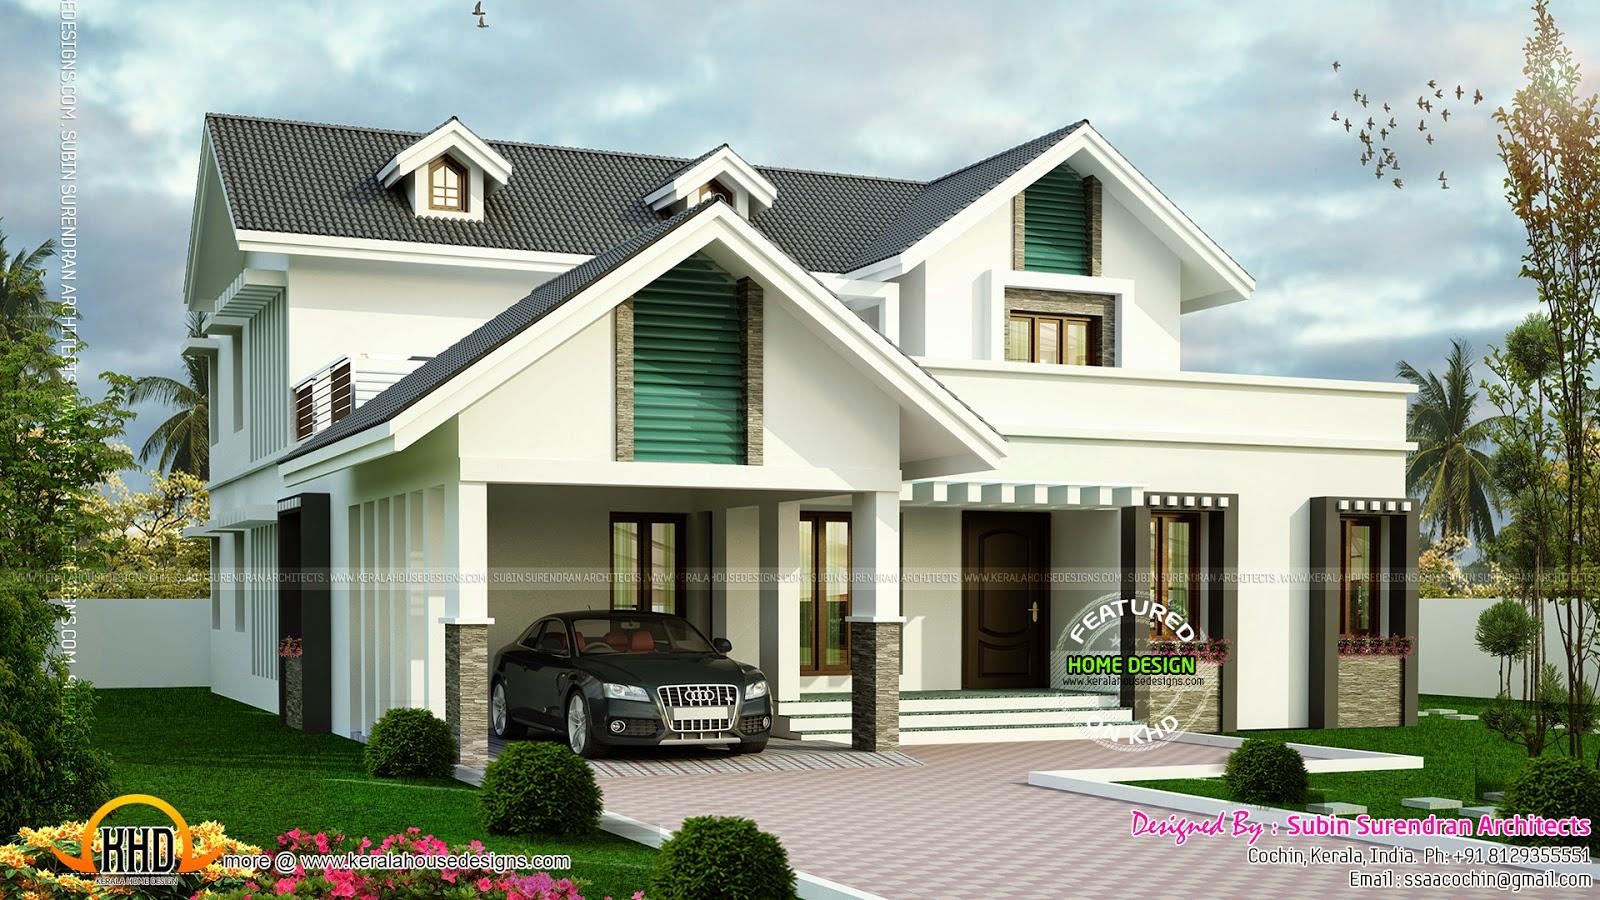 Modern sloping roof house with dormer windows kerala for Dormer designs